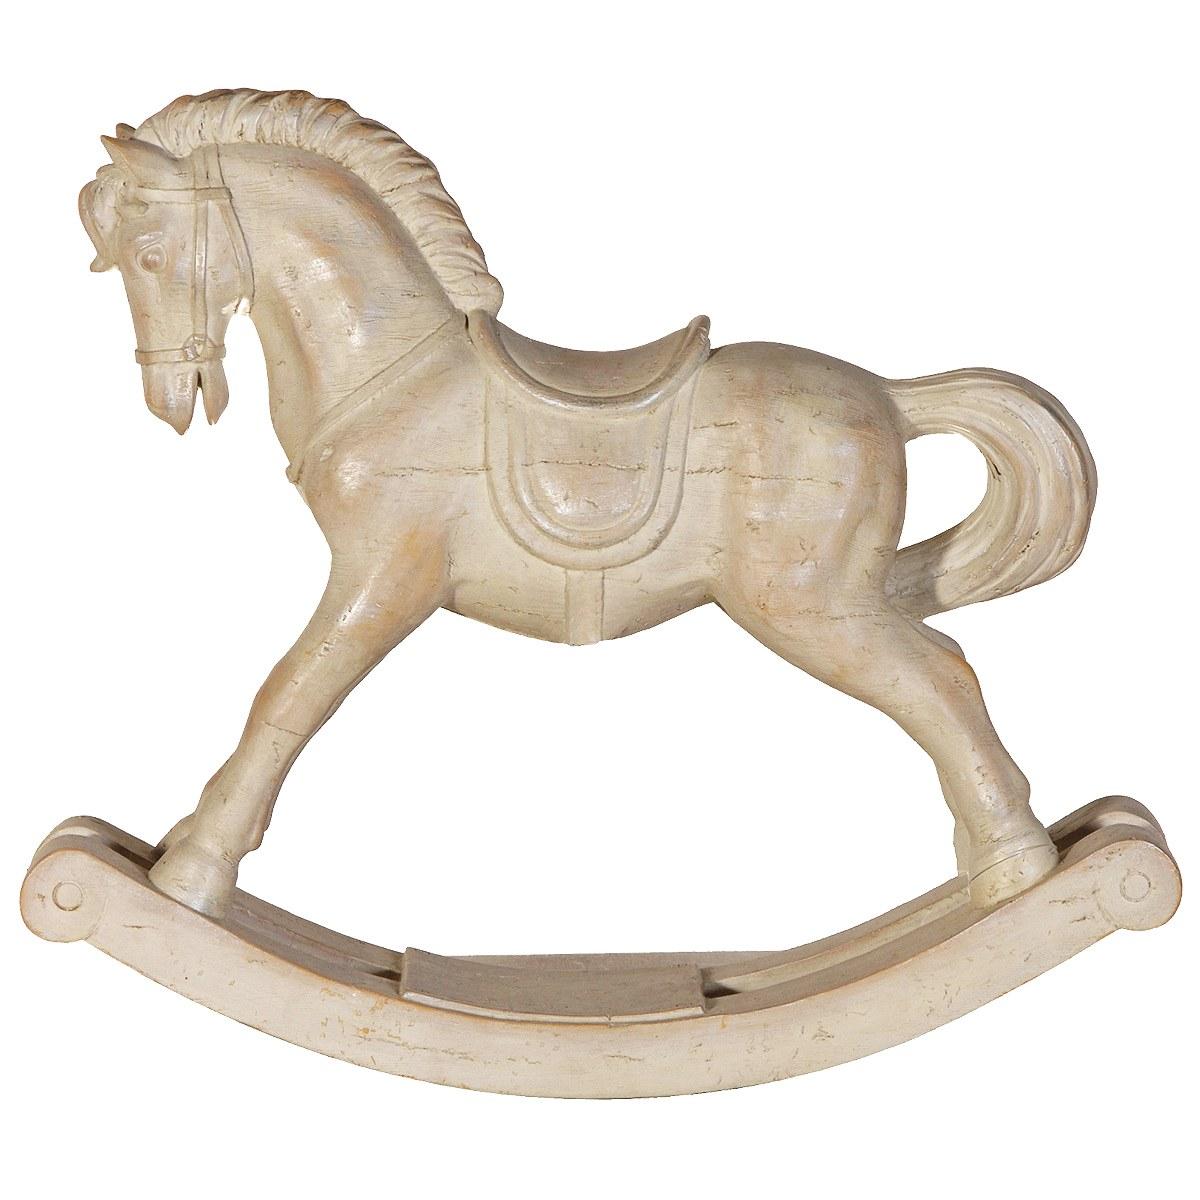 Miniature Rocking Horse, French Bedroom Company